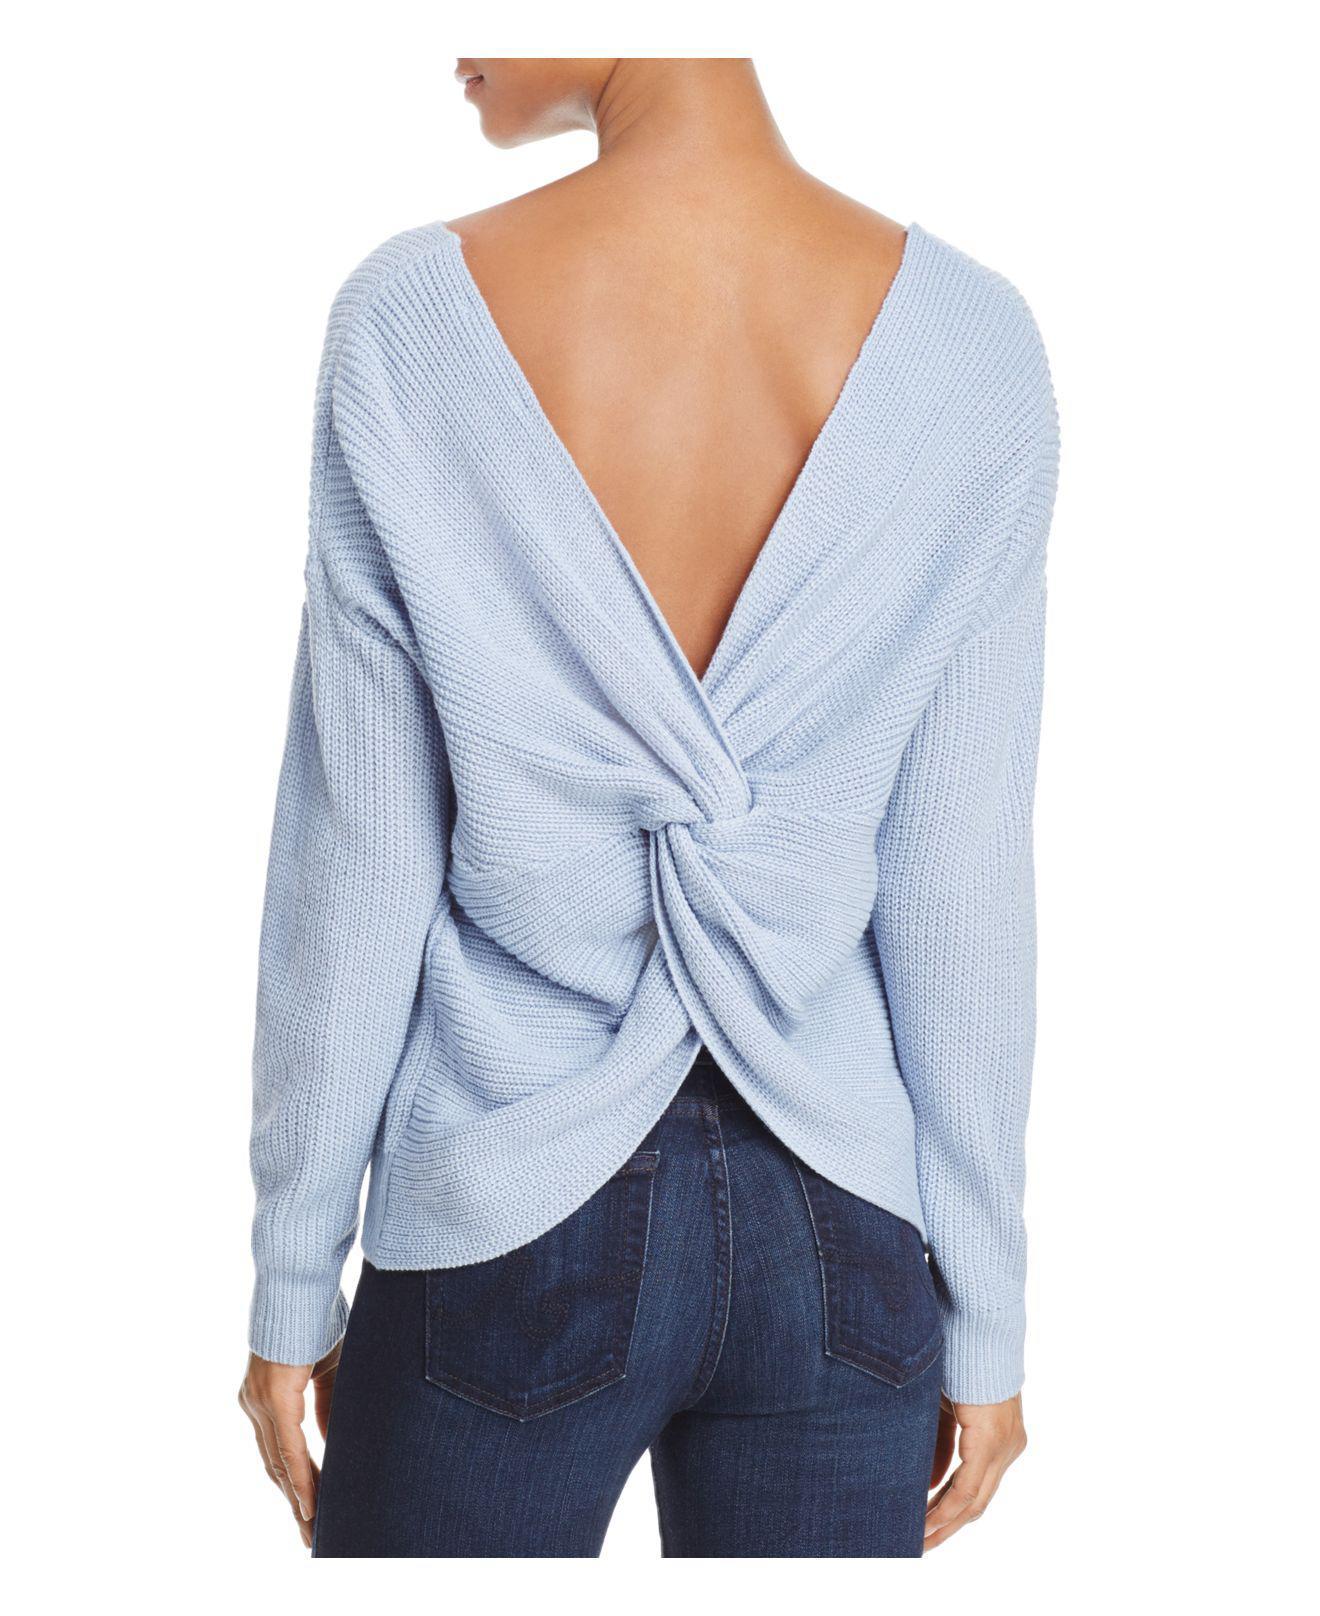 Lyst - Endless Rose Twist Back Sweater in Blue 55efa5a85